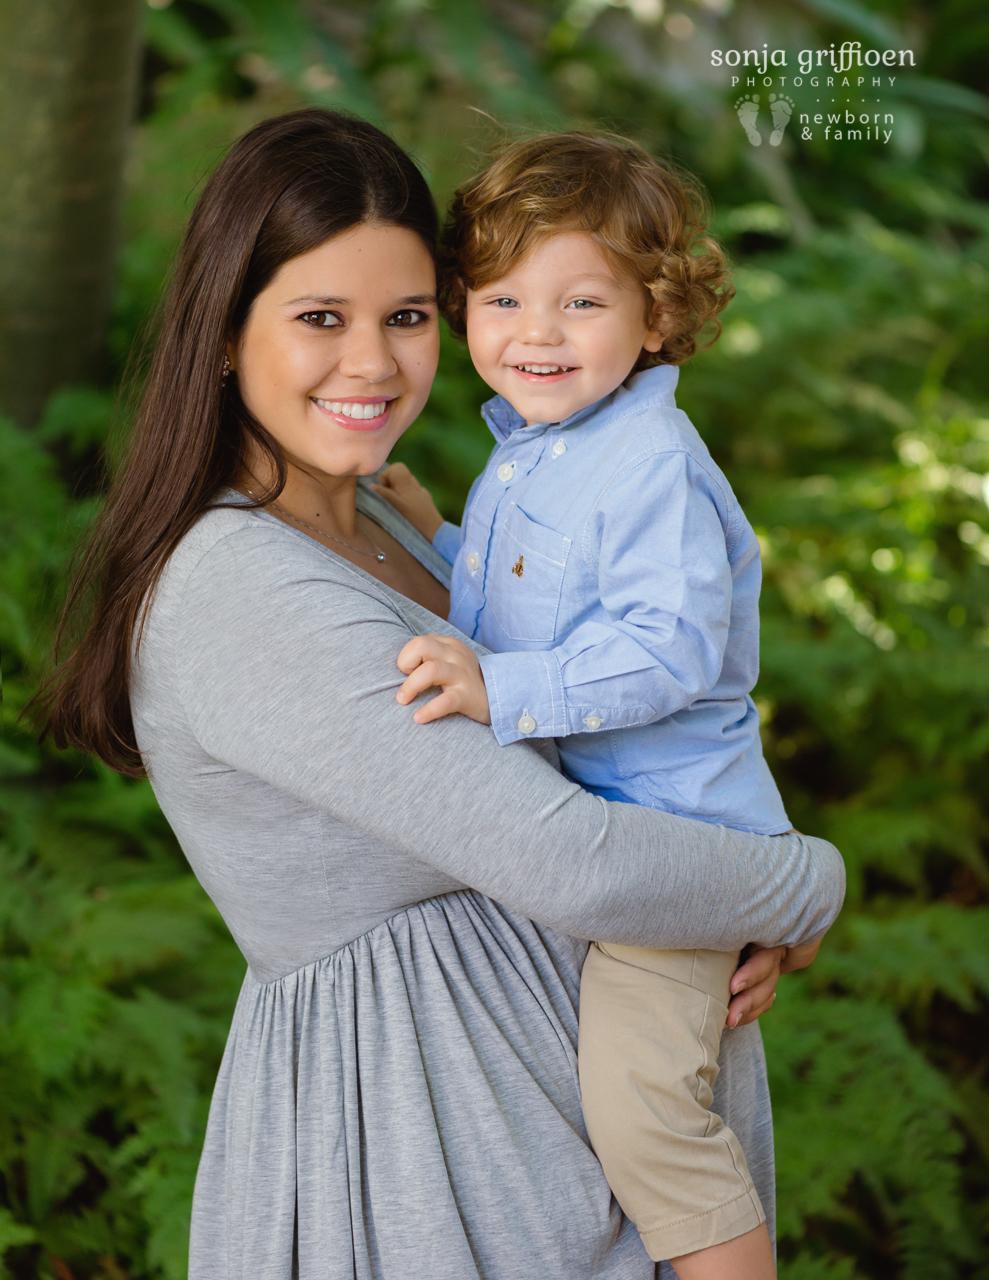 Maria-Maternity-Brisbane-Newborn-Photographer-Sonja-Griffioen-01.jpg